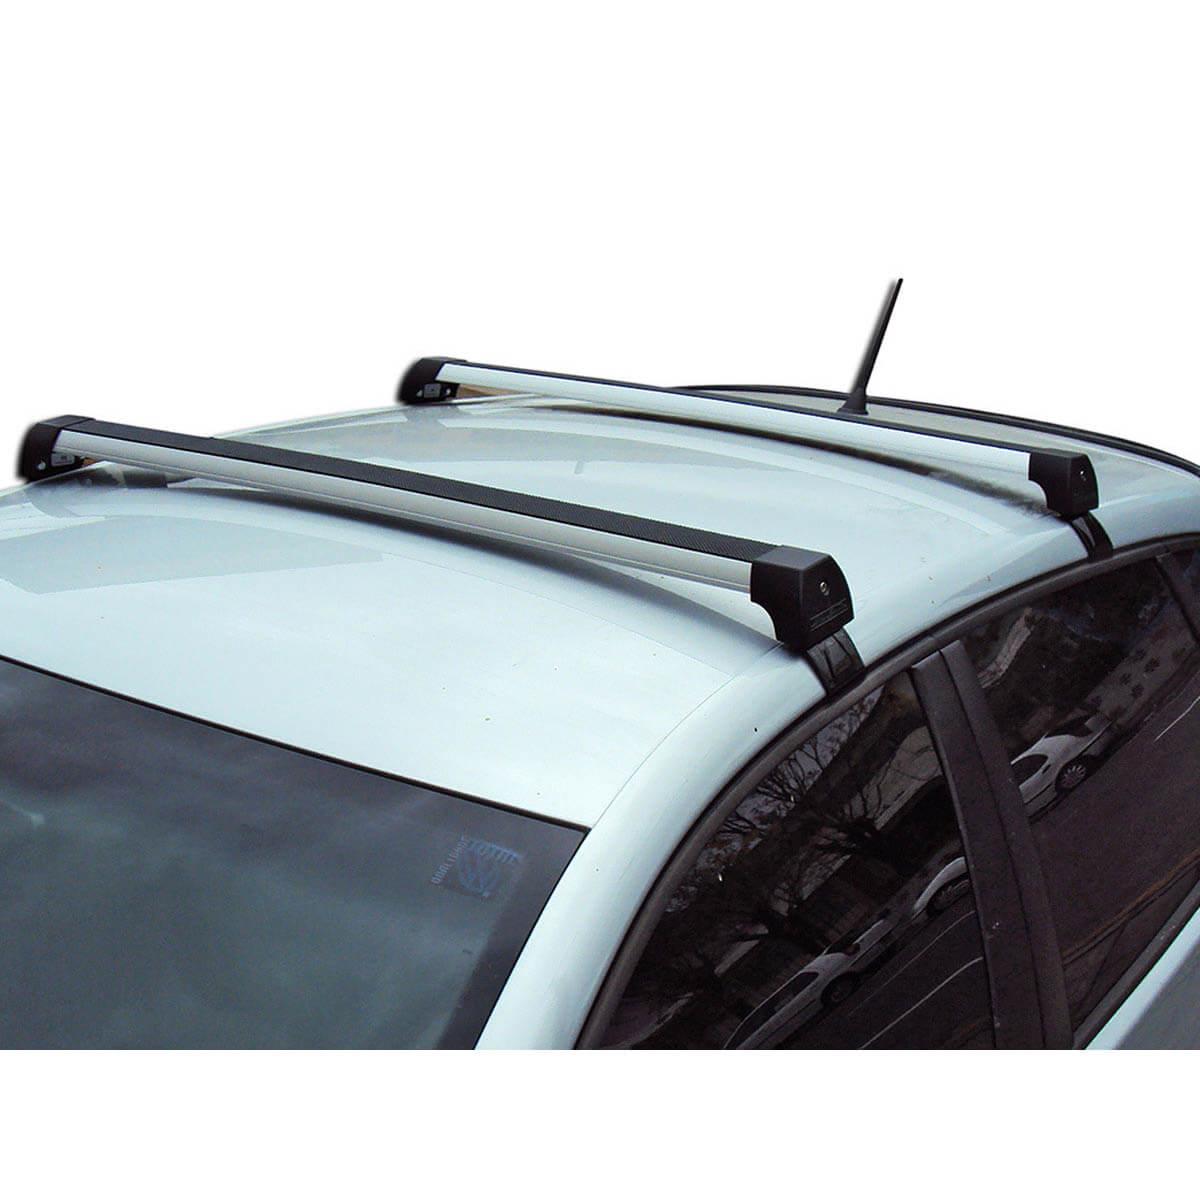 Rack de teto Peugeot 3008 2011 a 2015 sem teto solar Long Life Sports anodizado